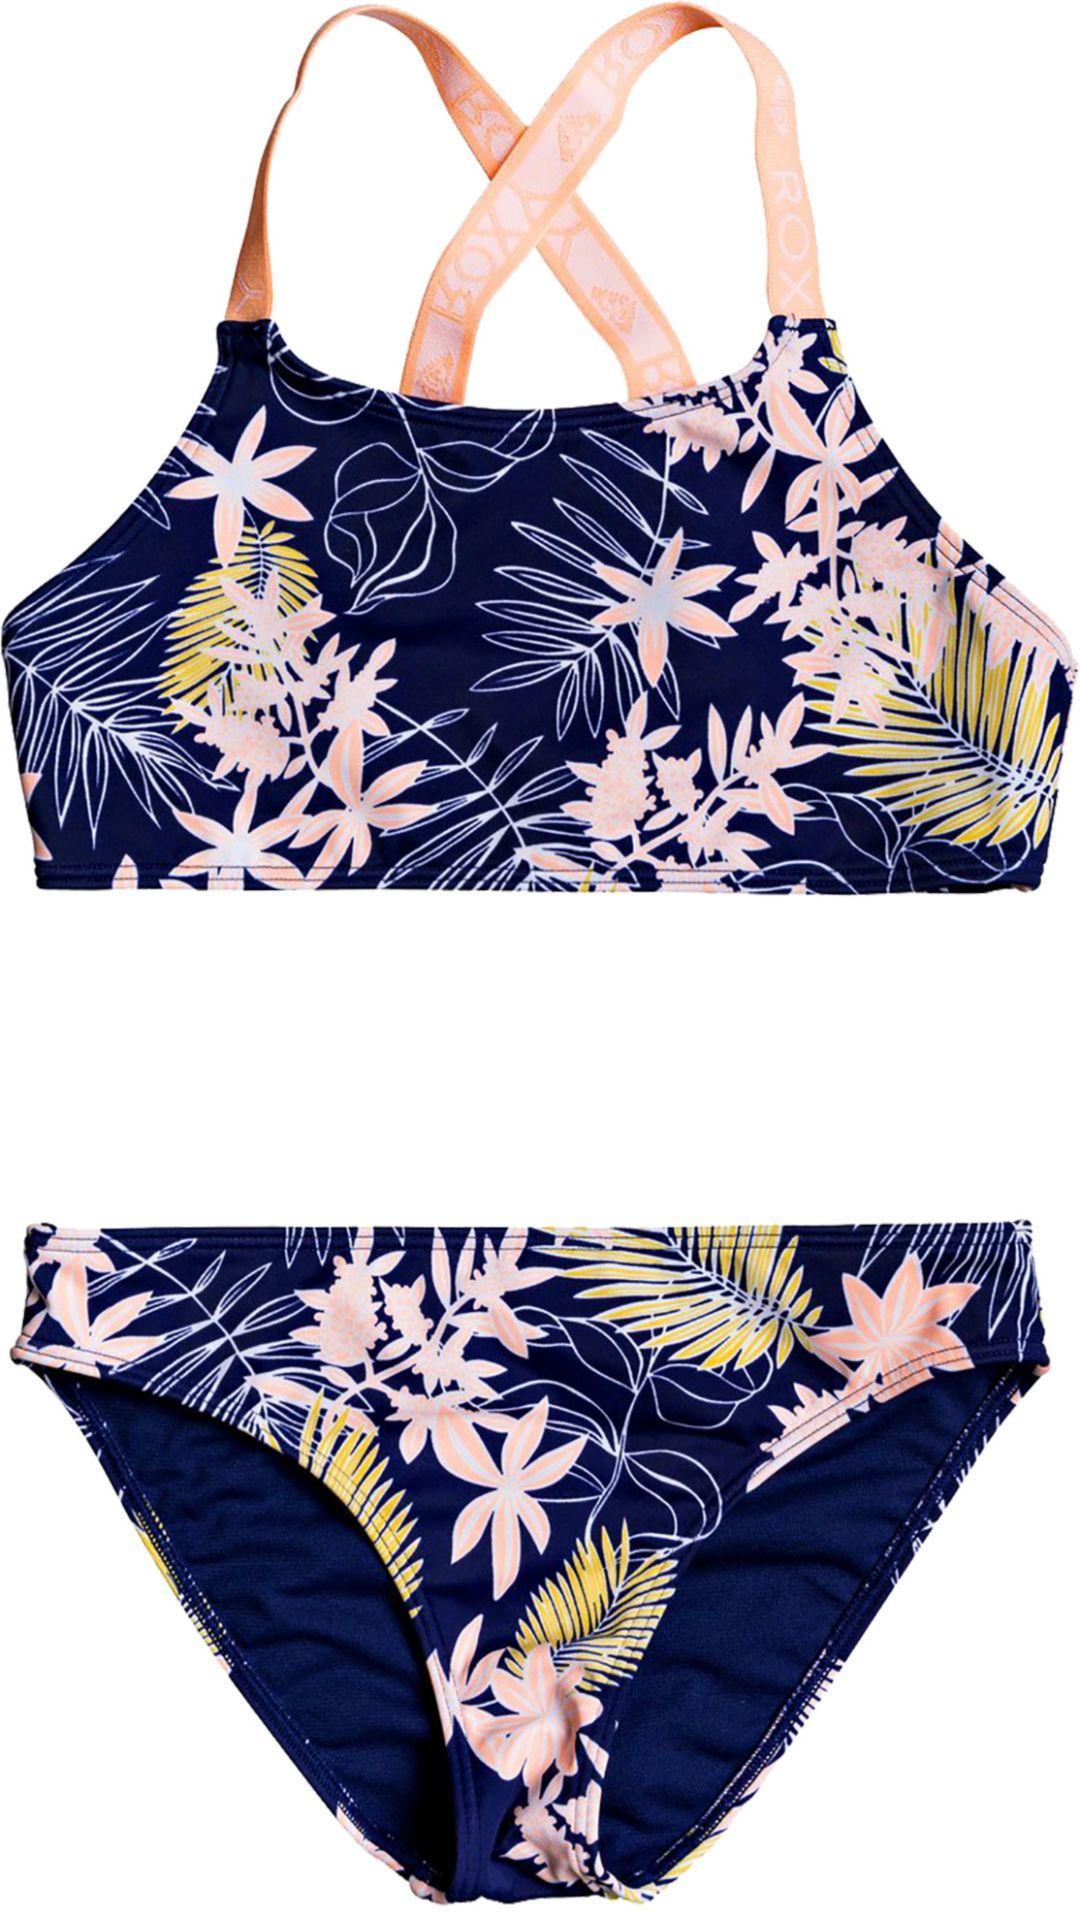 8c35d84963aa1 Roxy Girls' Bikini Point Crop Top Set. noImageFound. Previous